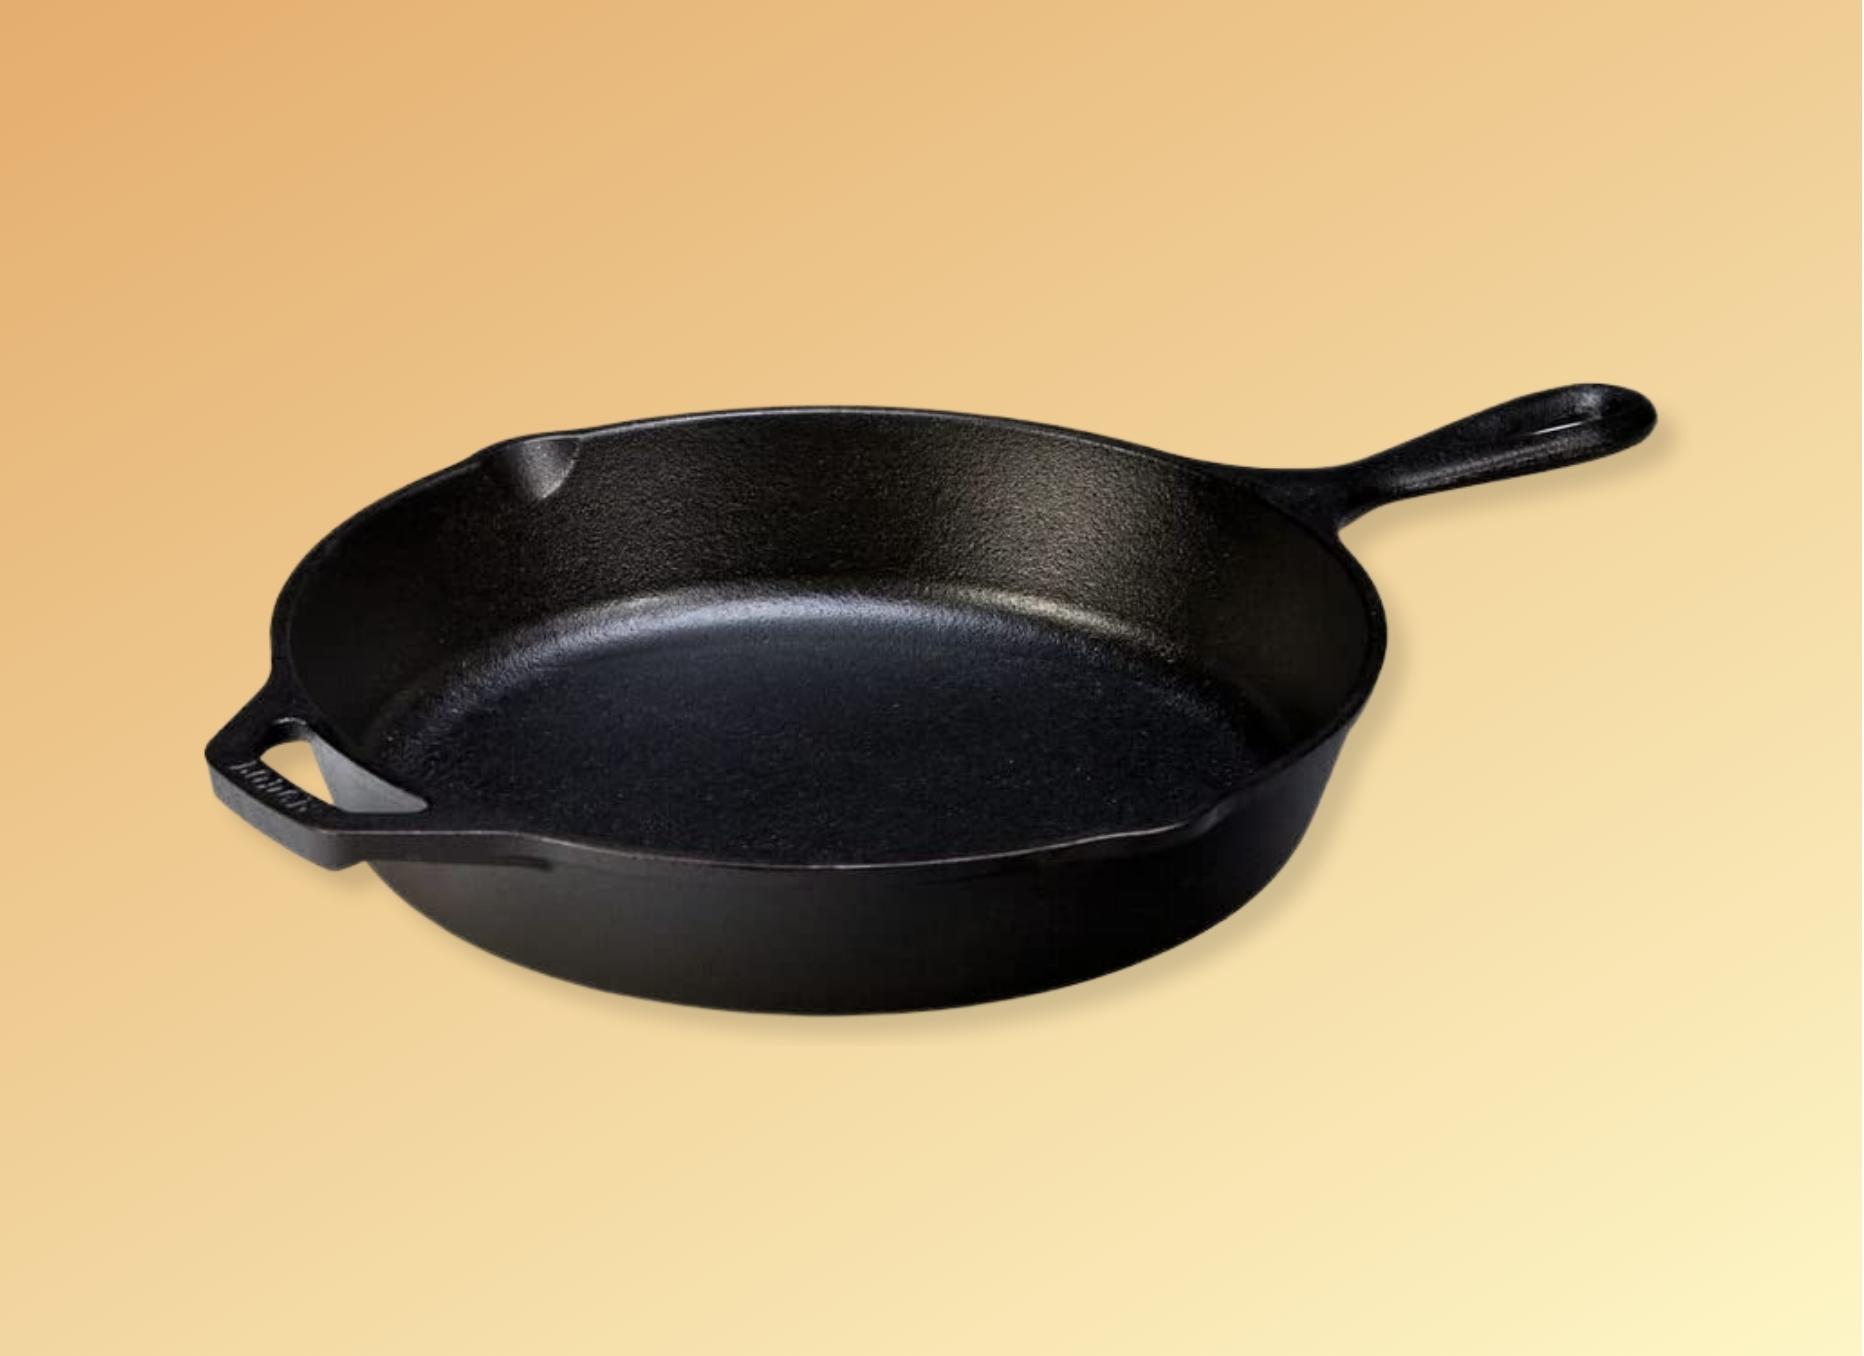 Lodge Cast Iron Pan